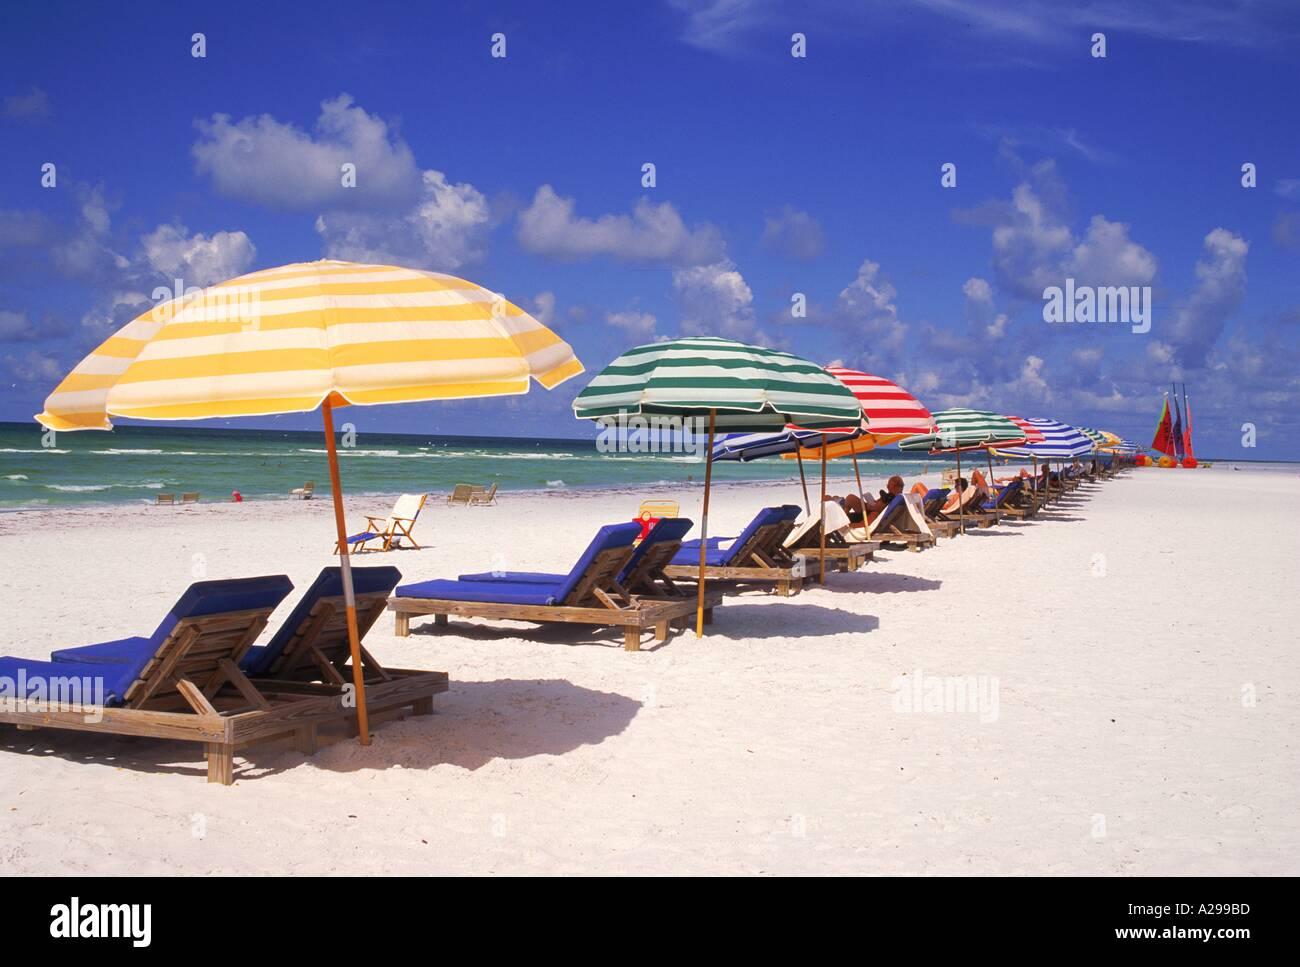 Striped parasols and loungers on beach at Longboat Key Sarasota Florida USA J Miller - Stock Image